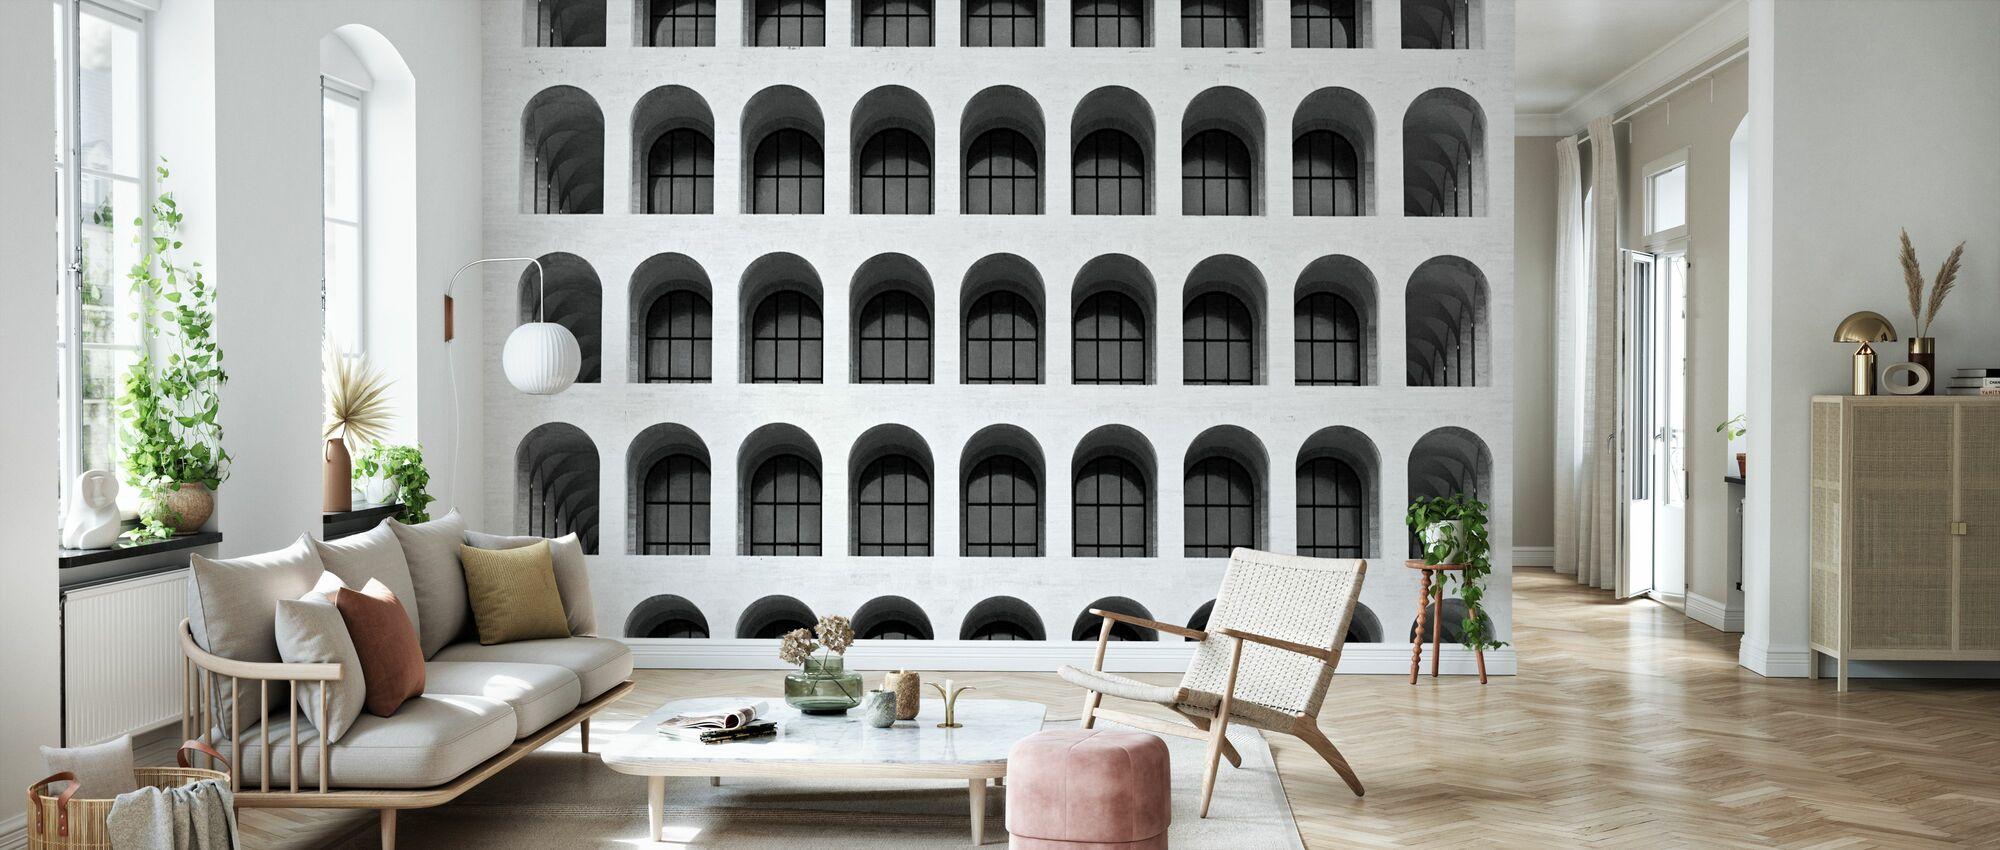 Colosseum-ikkunat - Tapetti - Olohuone